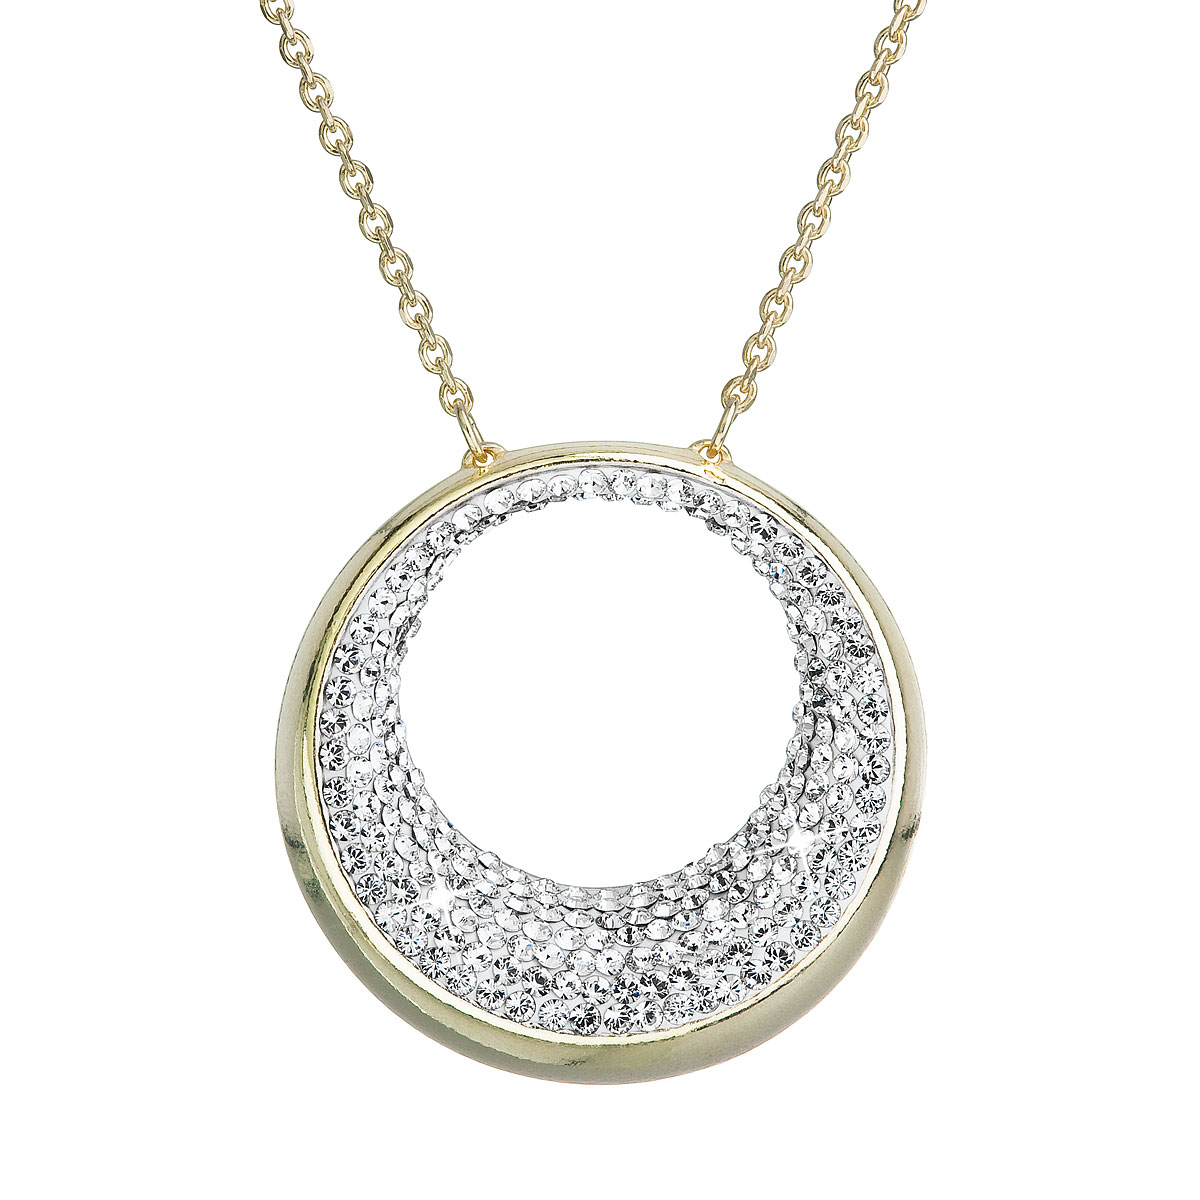 Evolution Group Stříbrný náhrdelník s krystaly Swarovski žlutý 32026.1